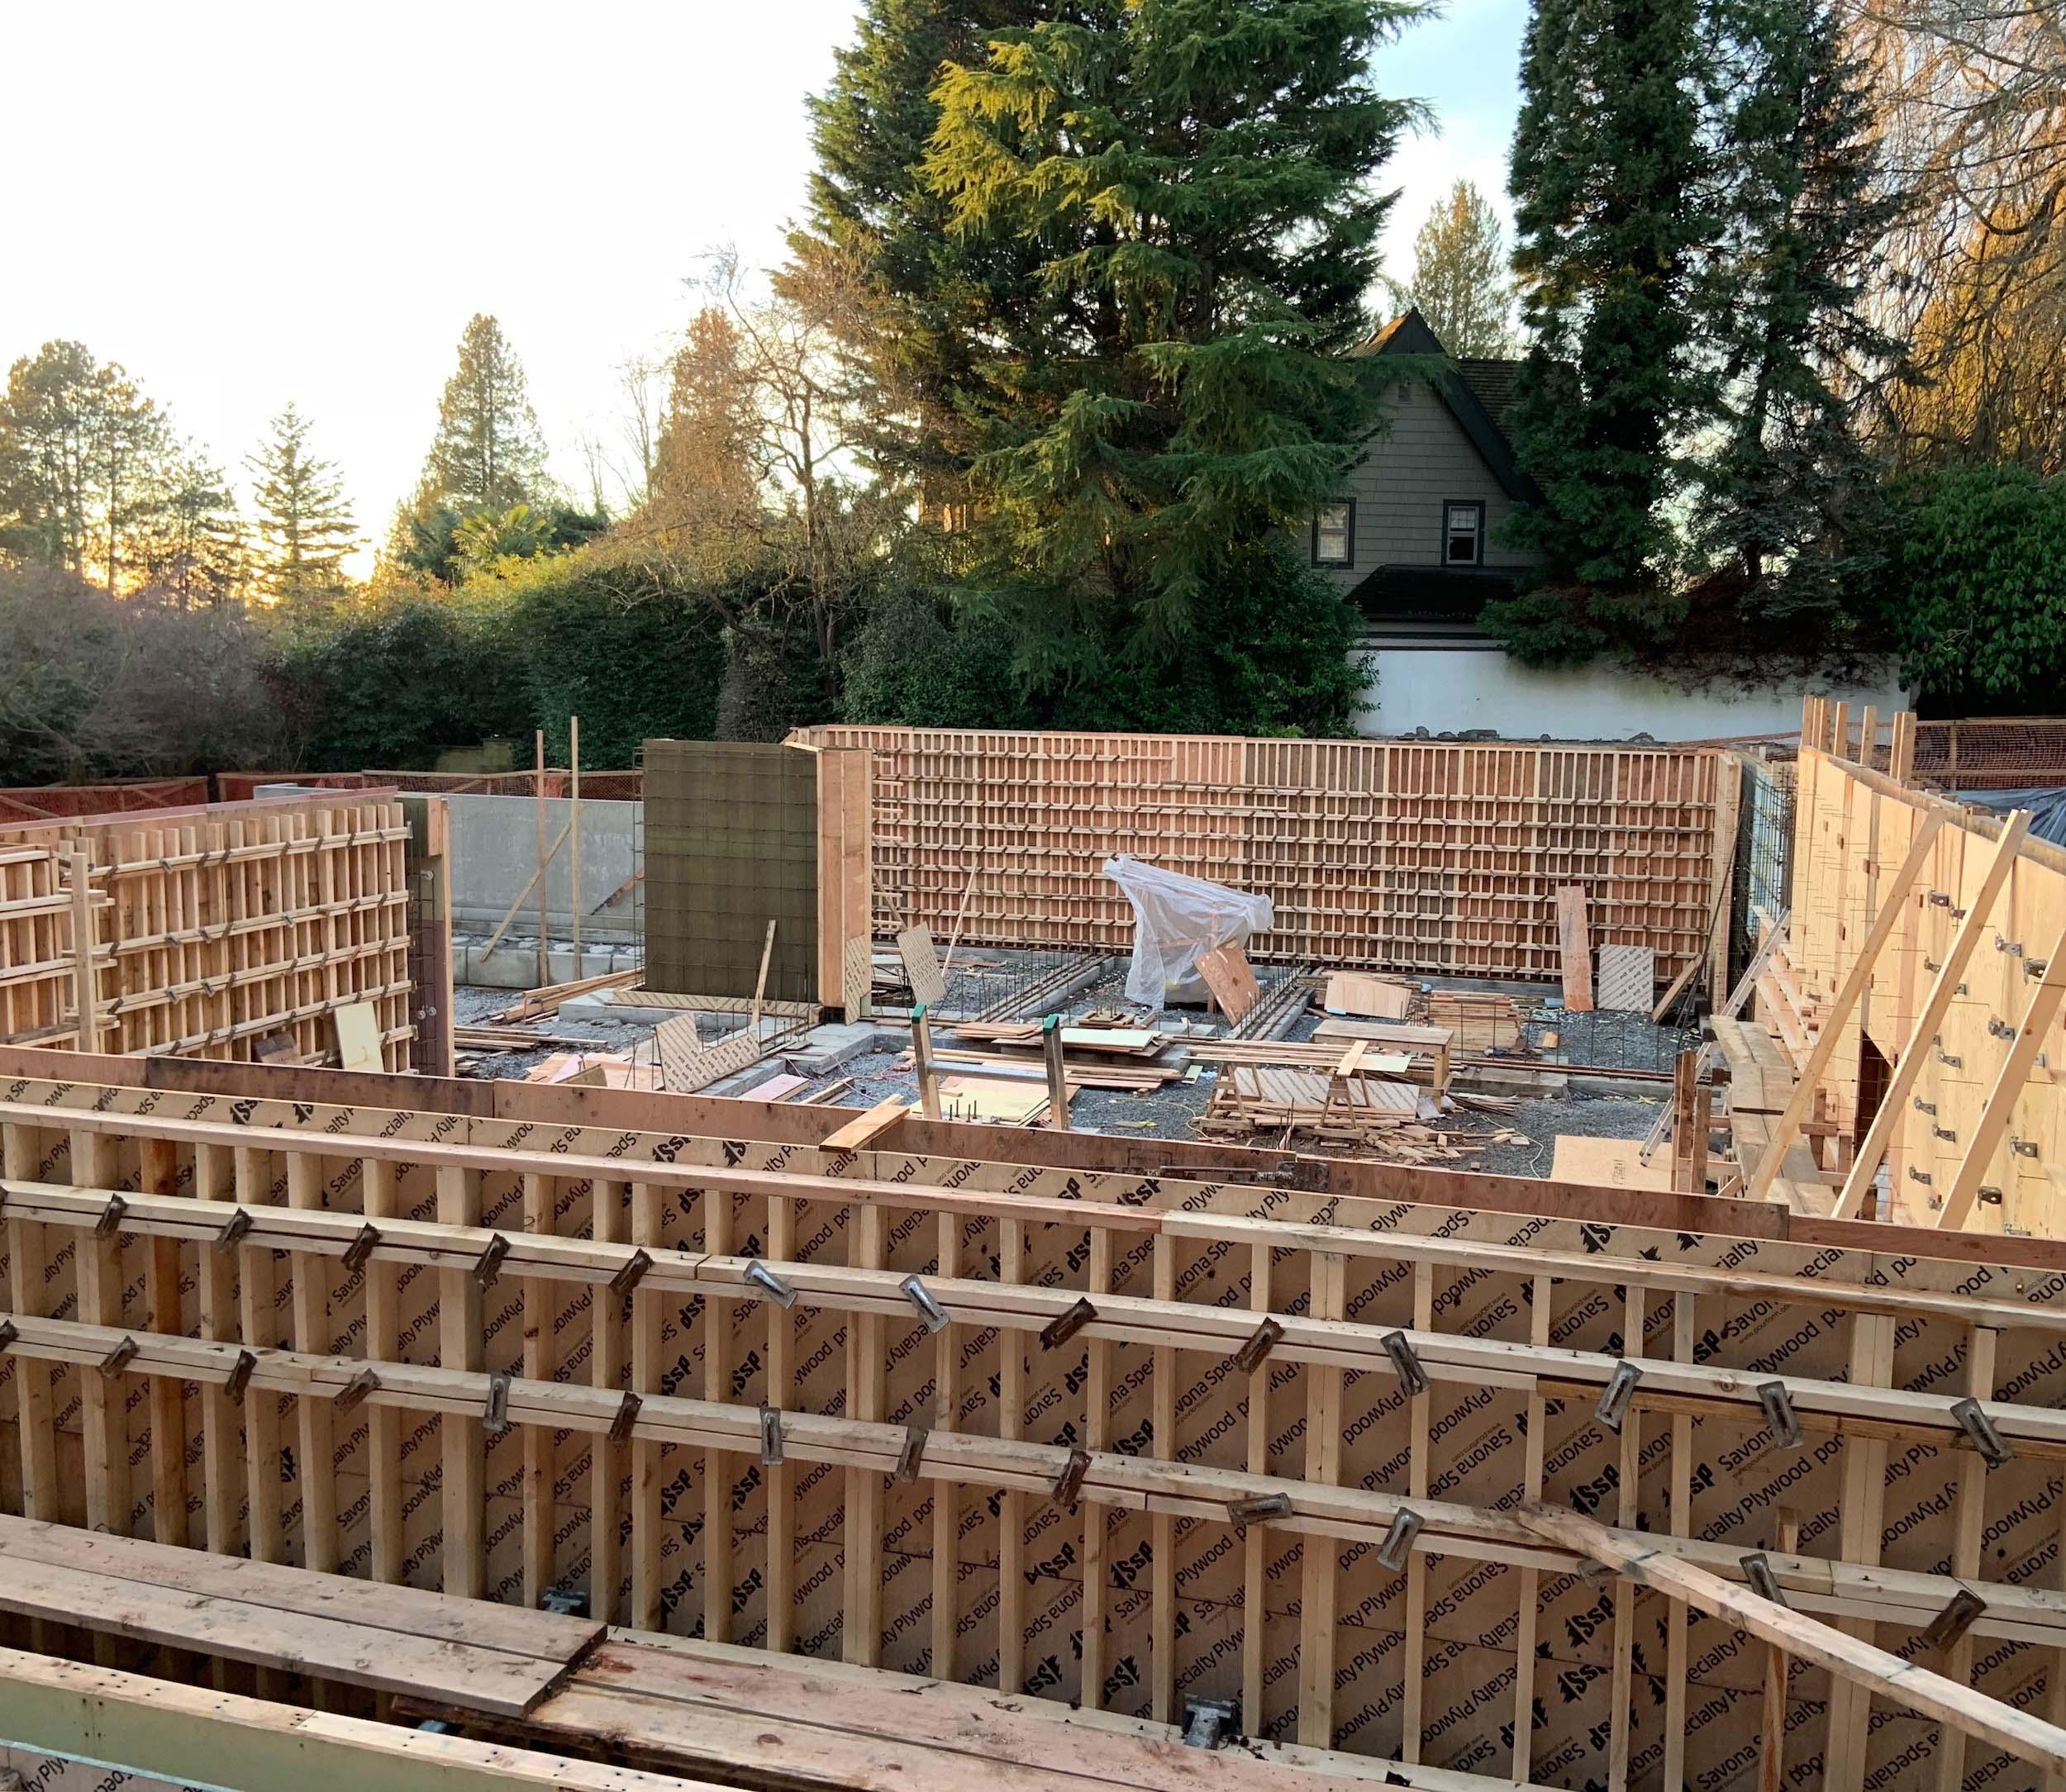 Postle_Construction_ConcreteForming5.jpg